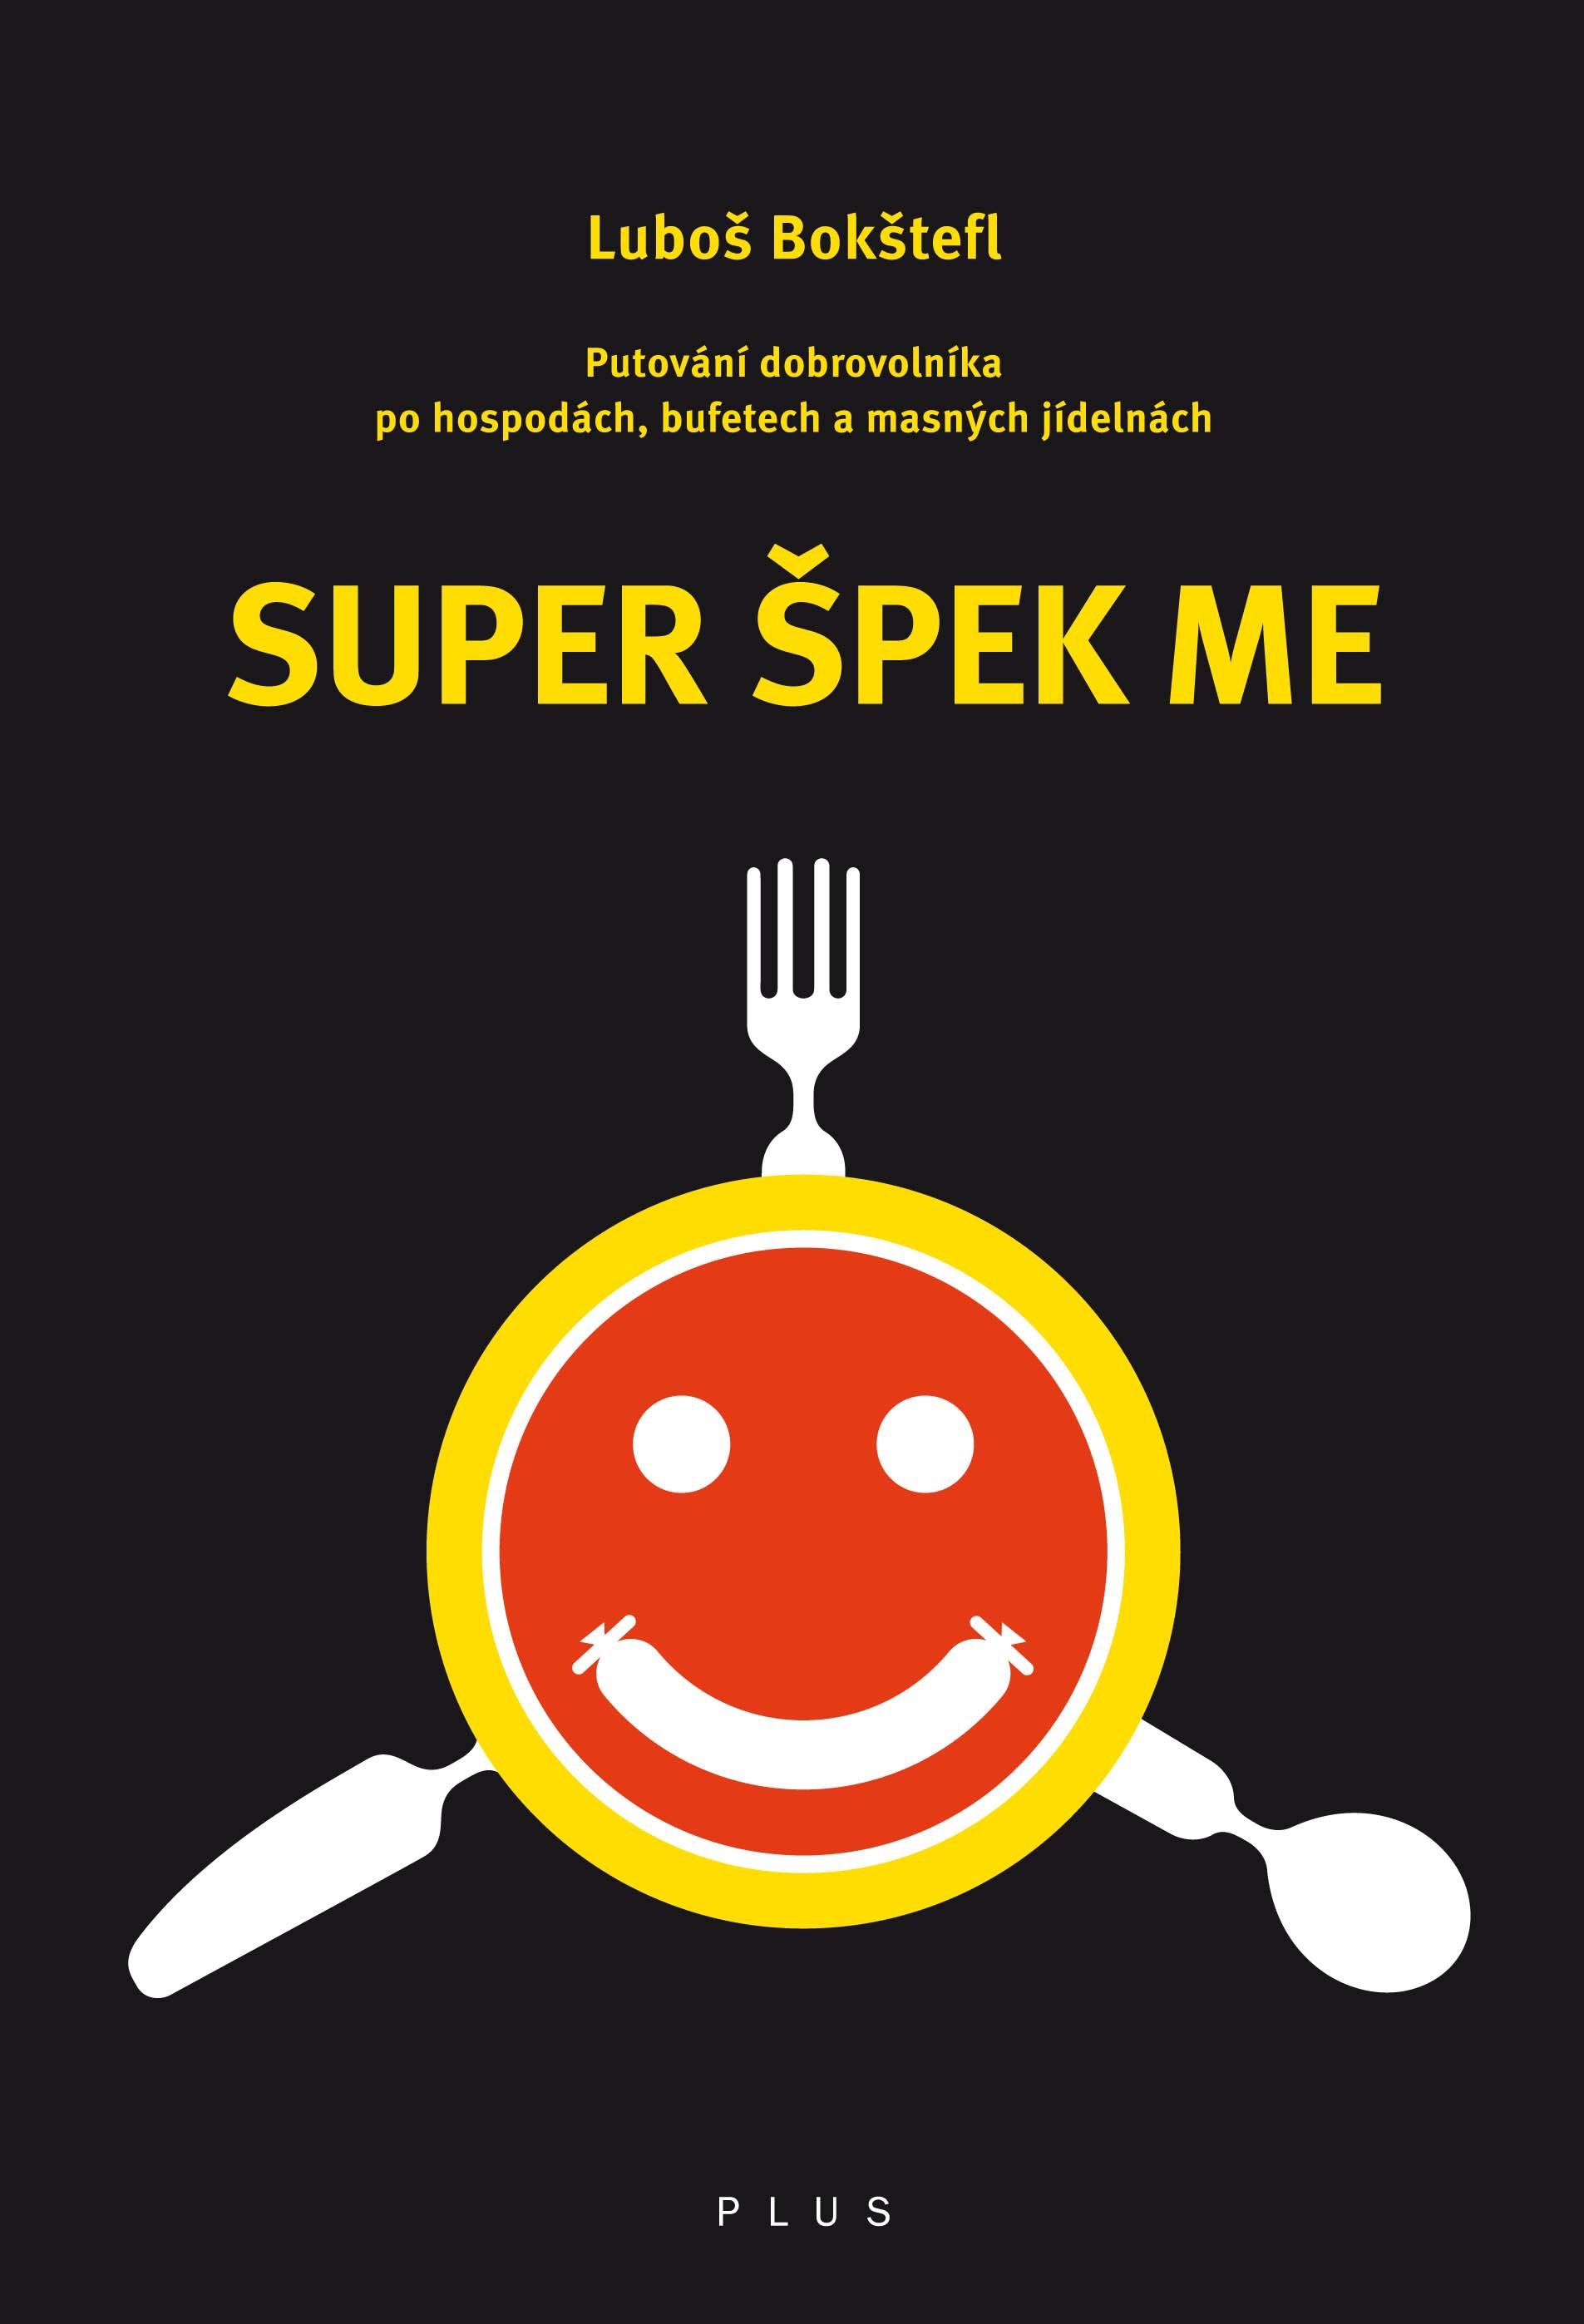 Super Špek Me | Luboš Bokštefl